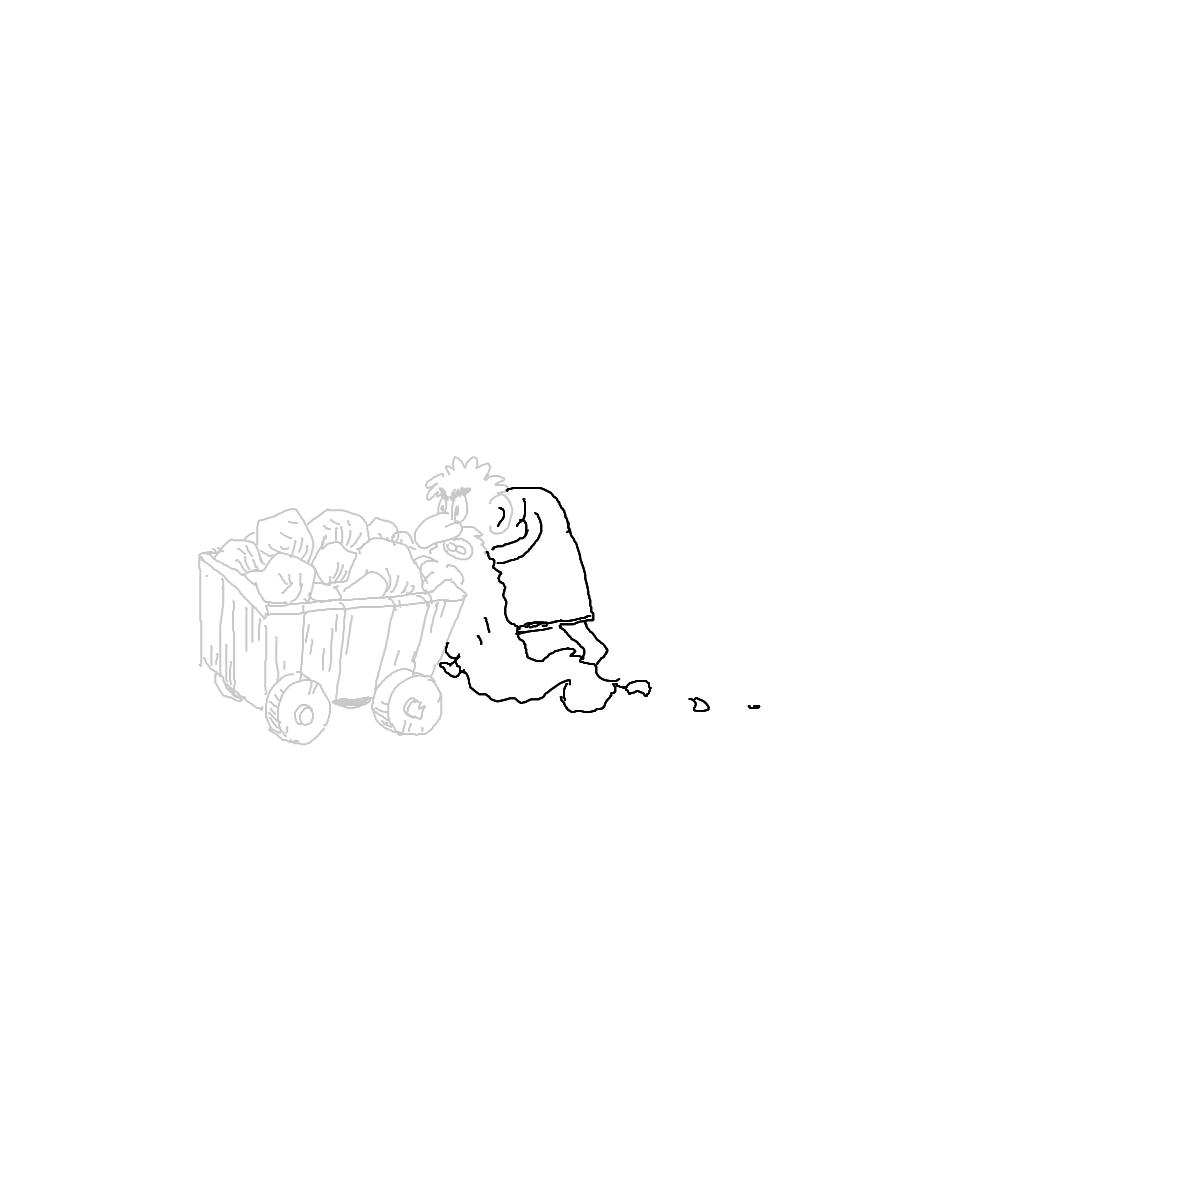 BAAAM drawing#6935 lat:78.4207153320312500lng: -4.4898724555969240